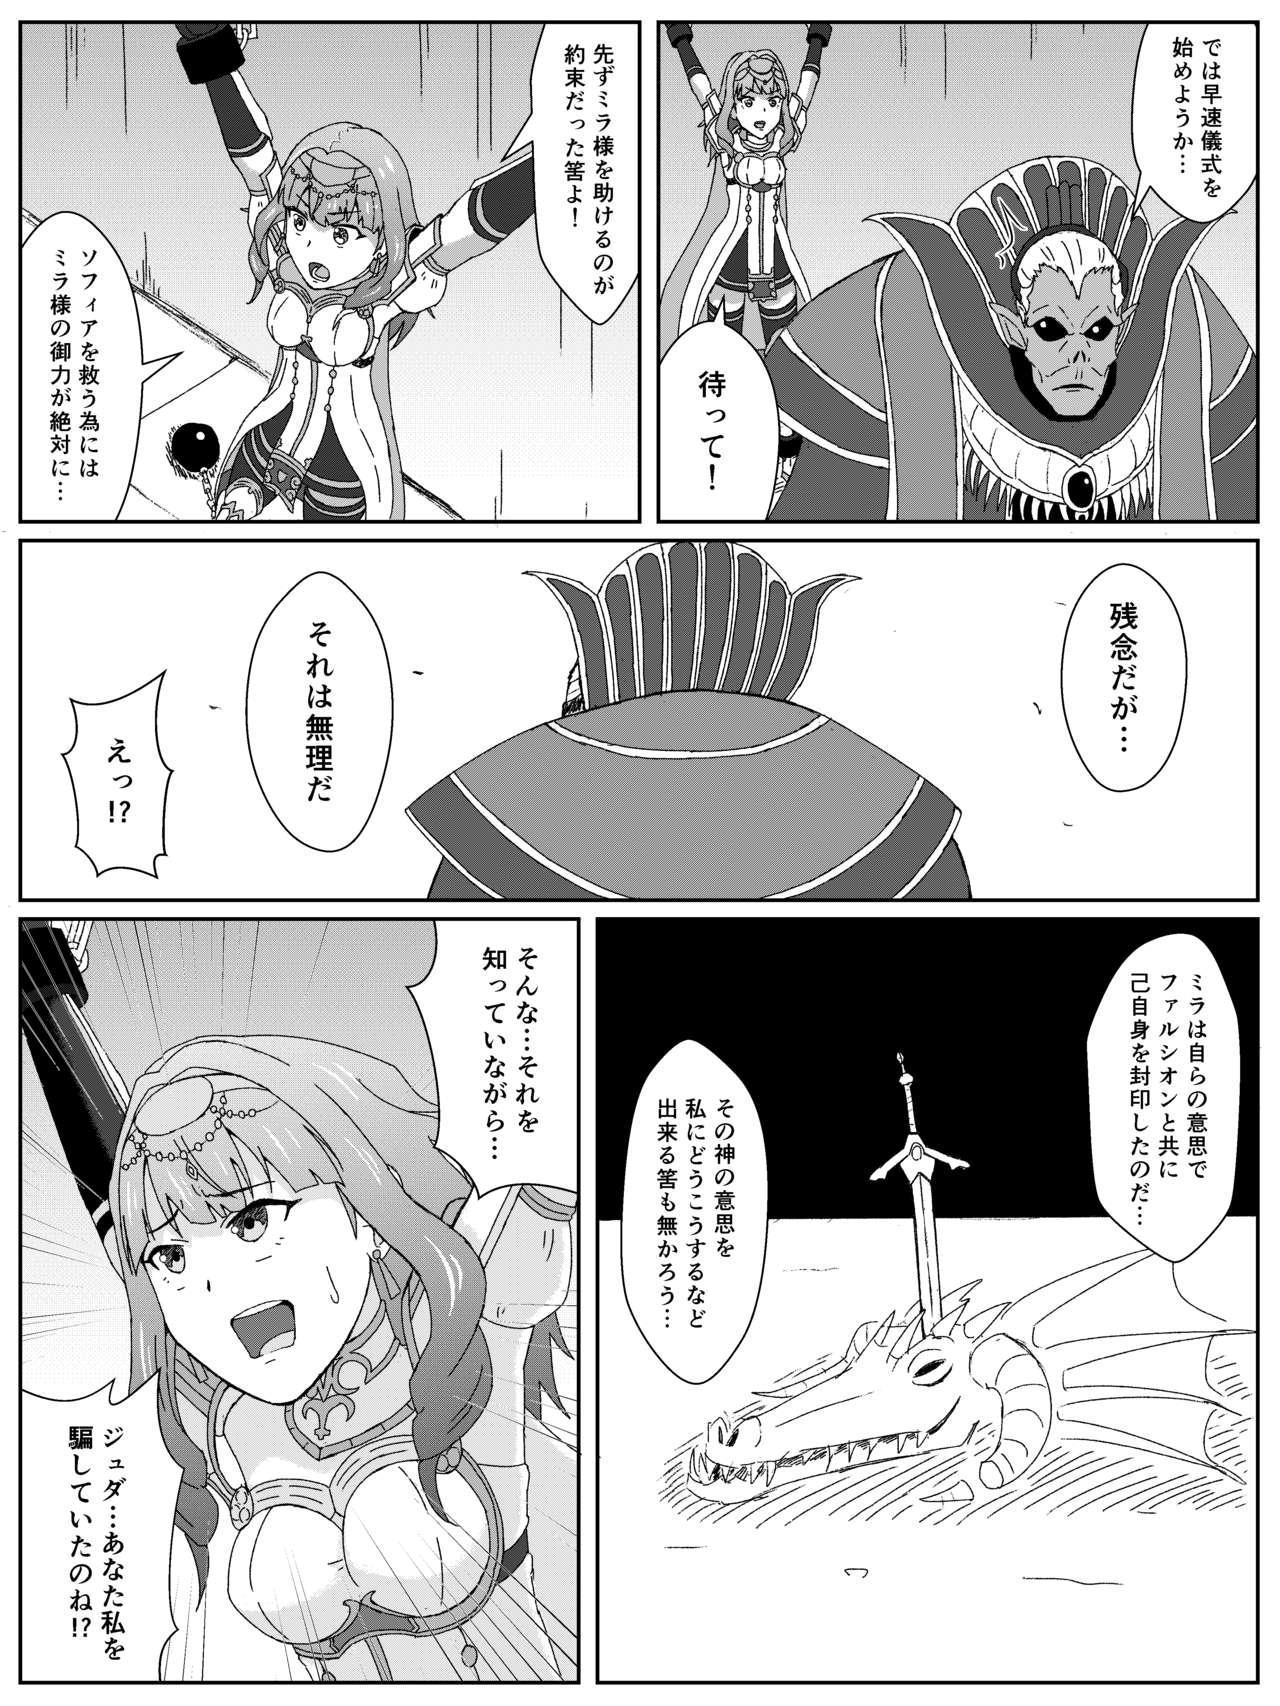 Fire Emblem Echoes no Celica Akuochi Manga 2